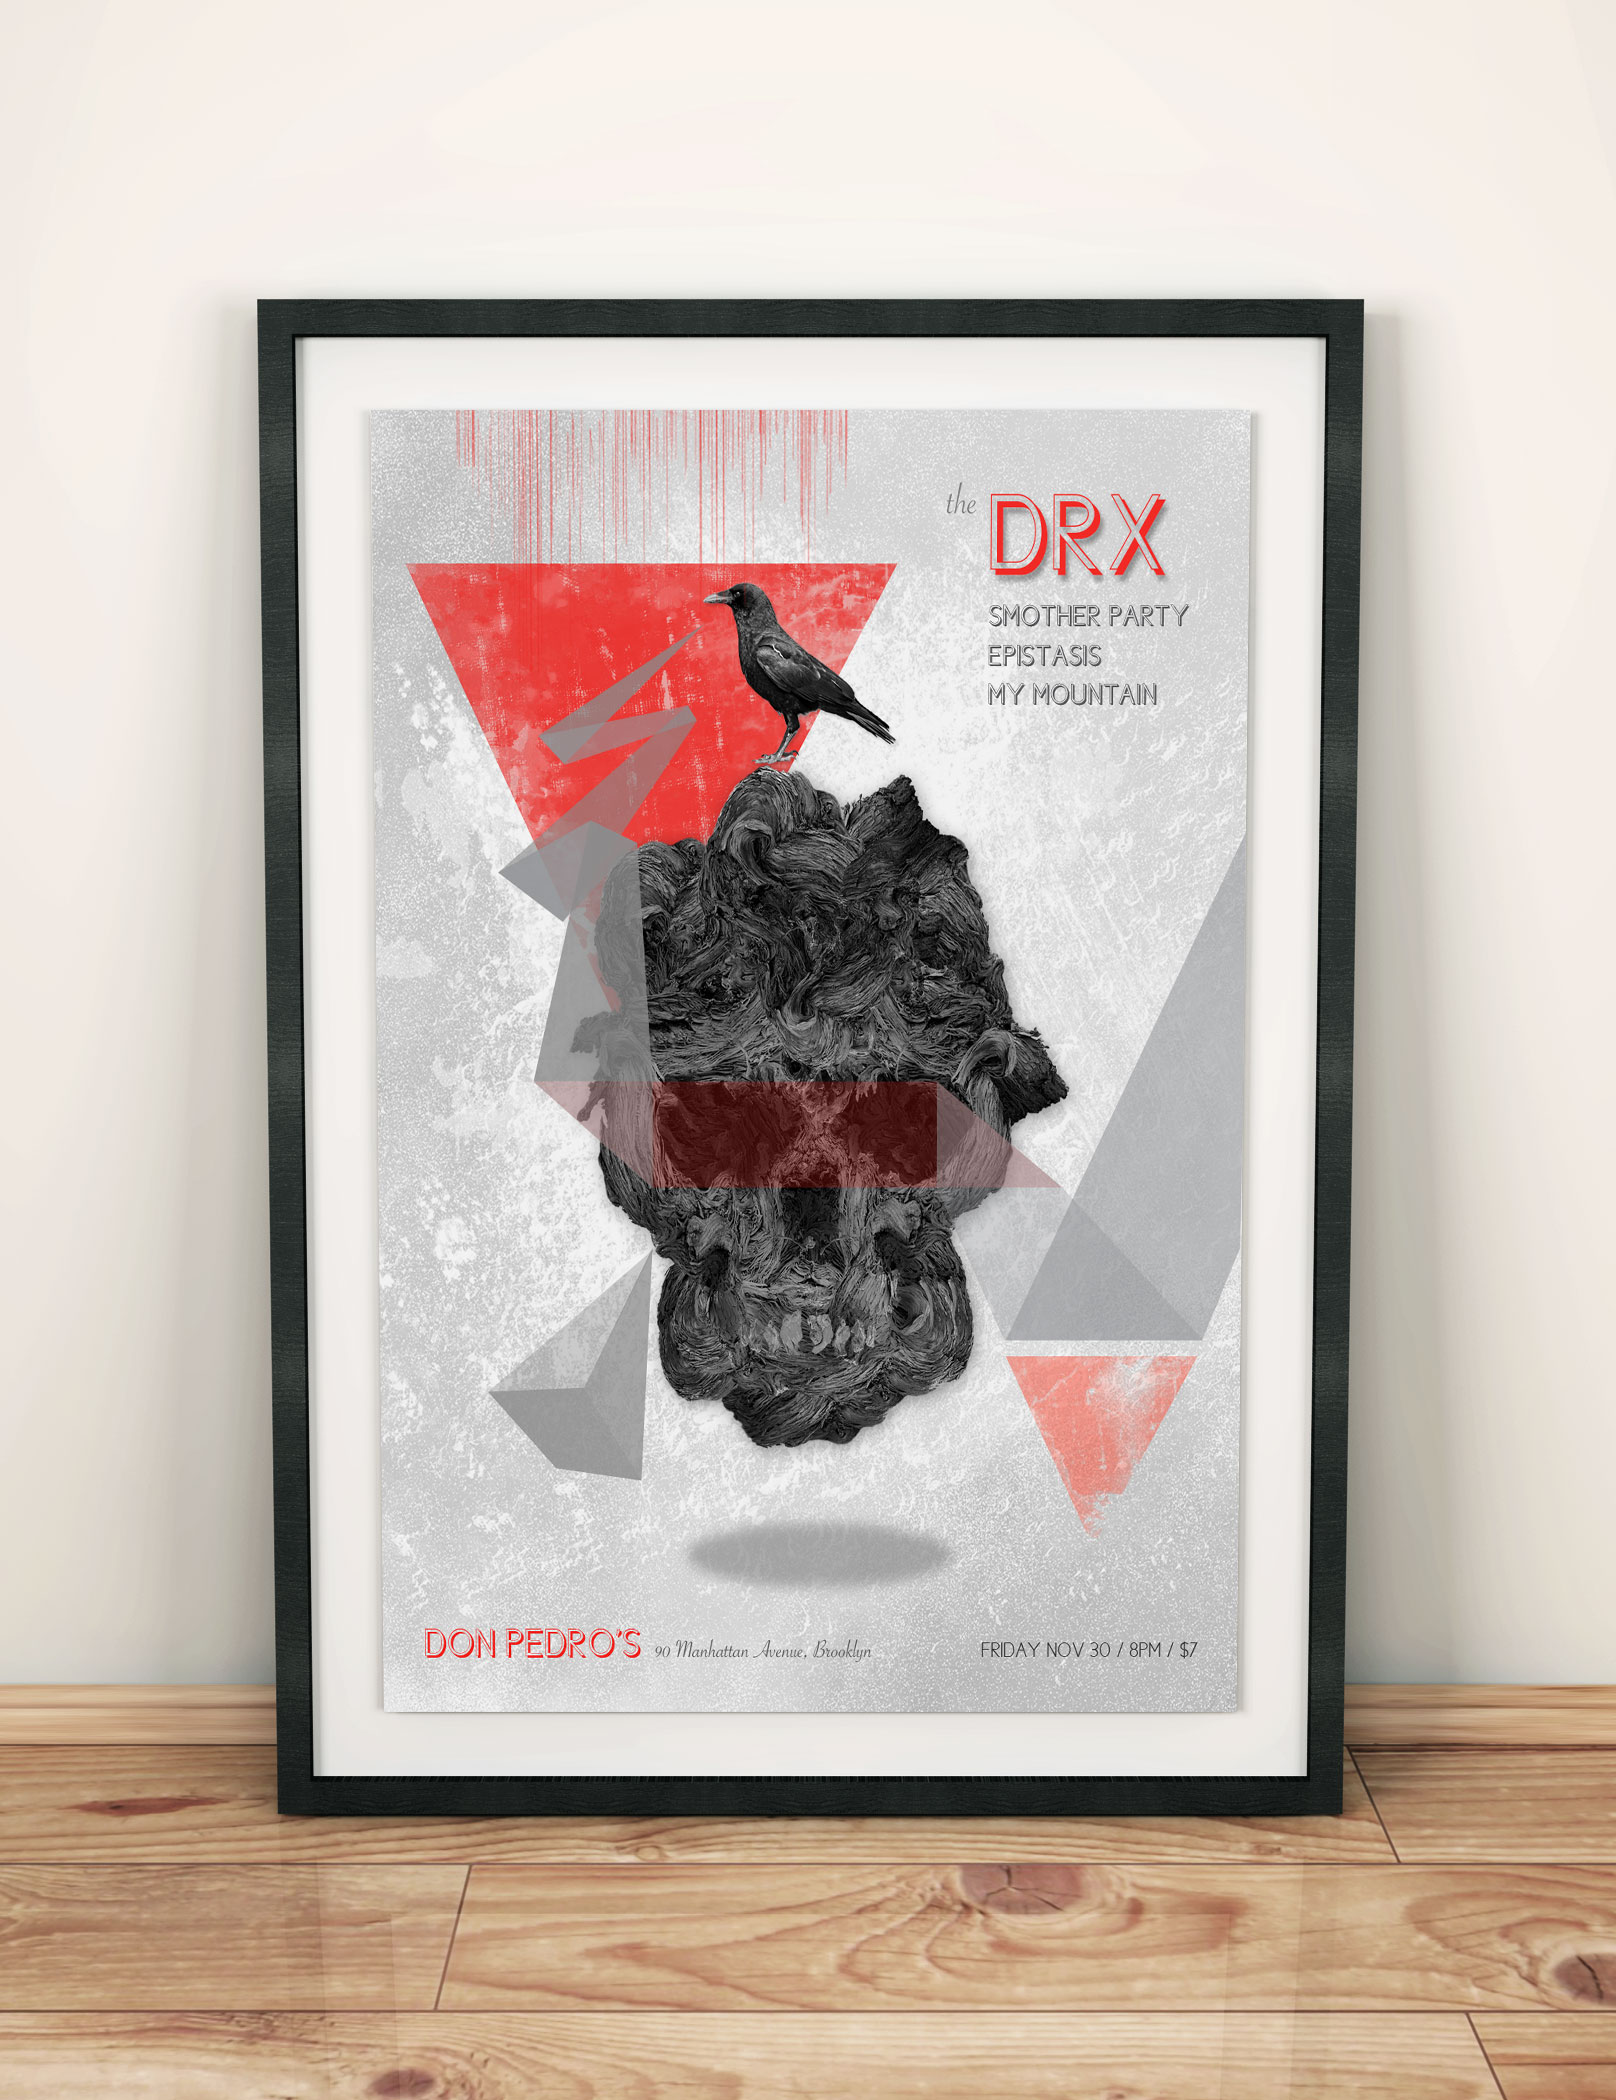 DRX-DonPedros_frame.jpg